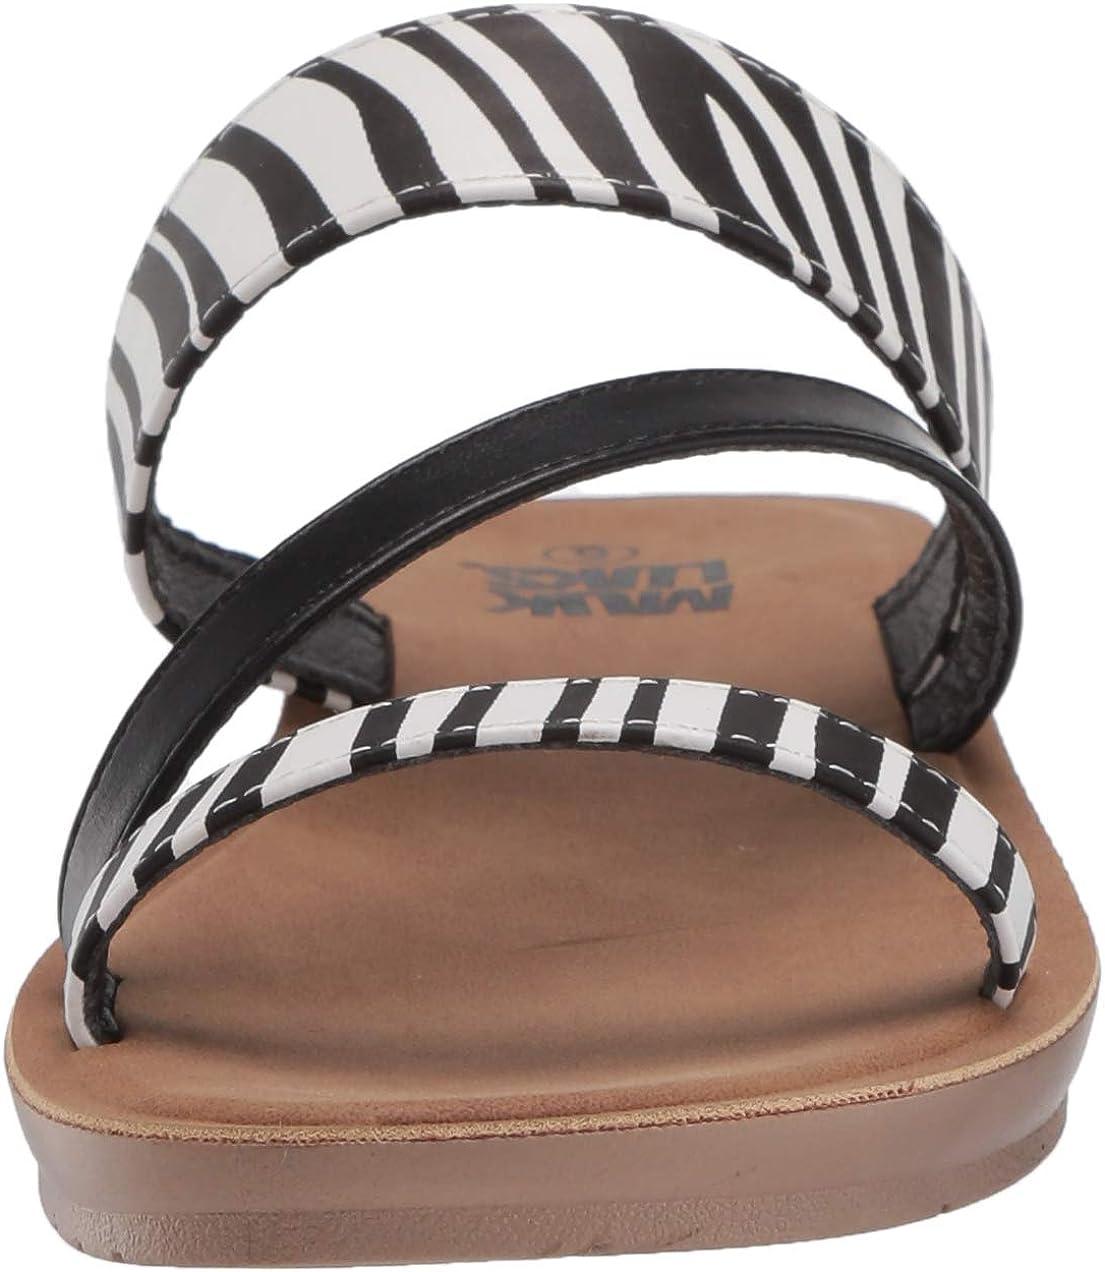 MUK LUKS Women's Dahlia Strap Sandal-Black